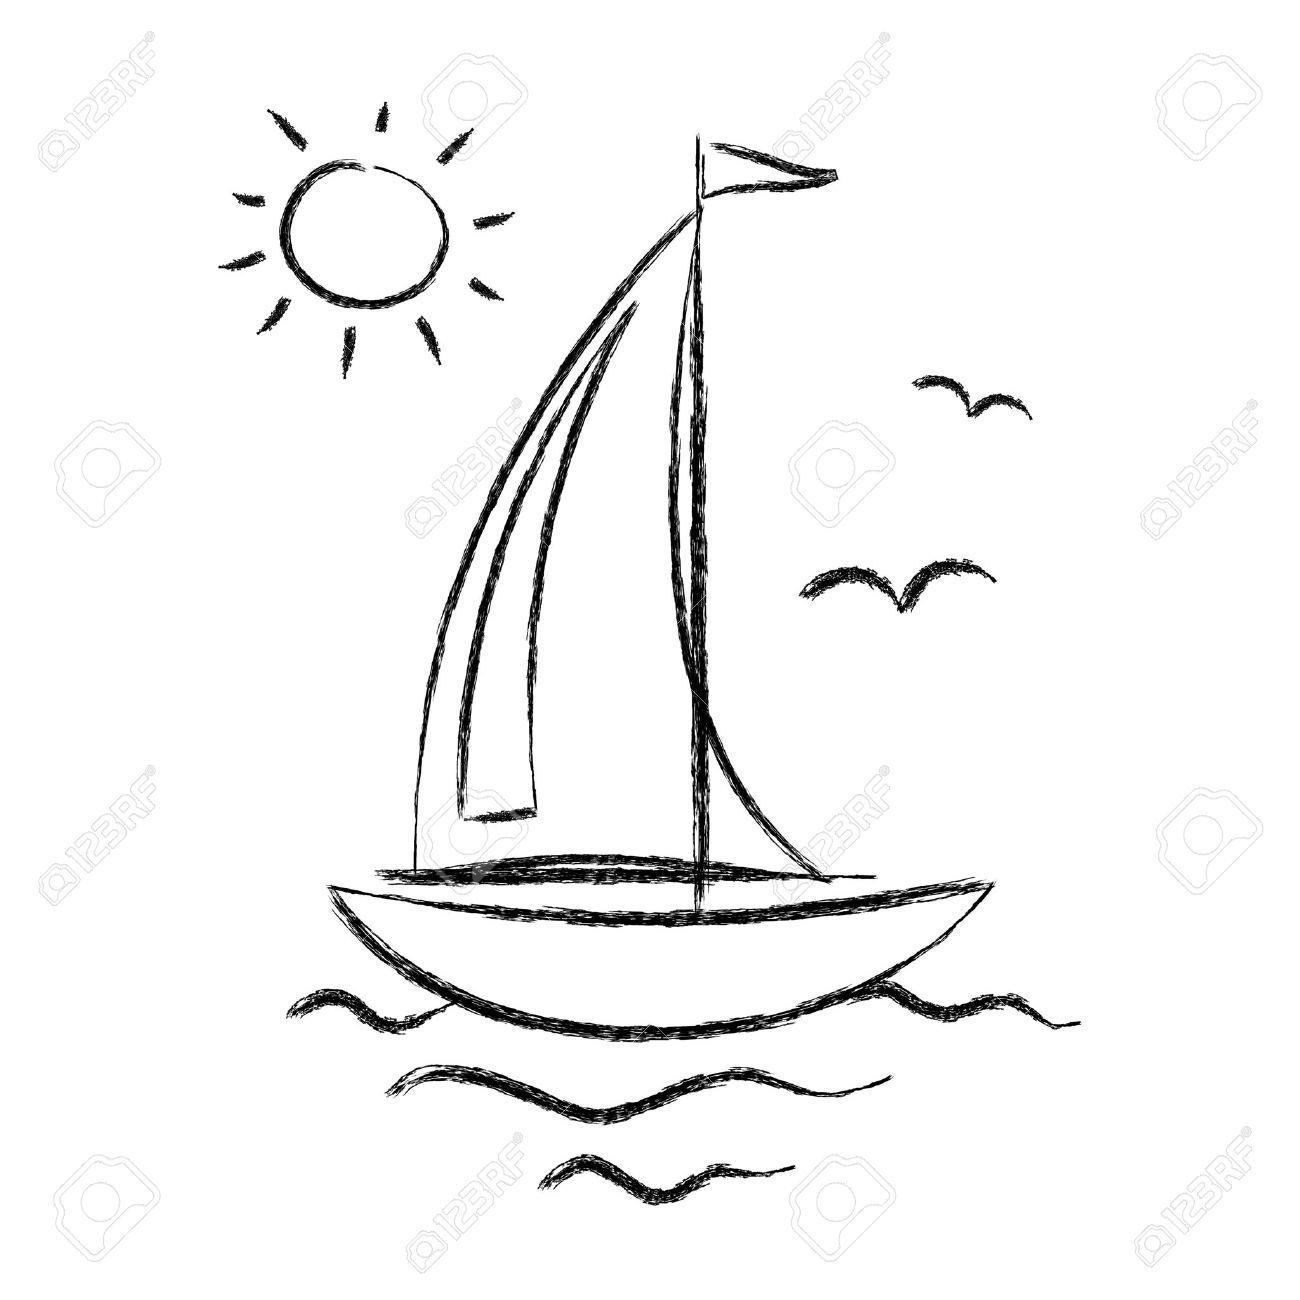 35 Awesome Sailing Boat Cartoon Images